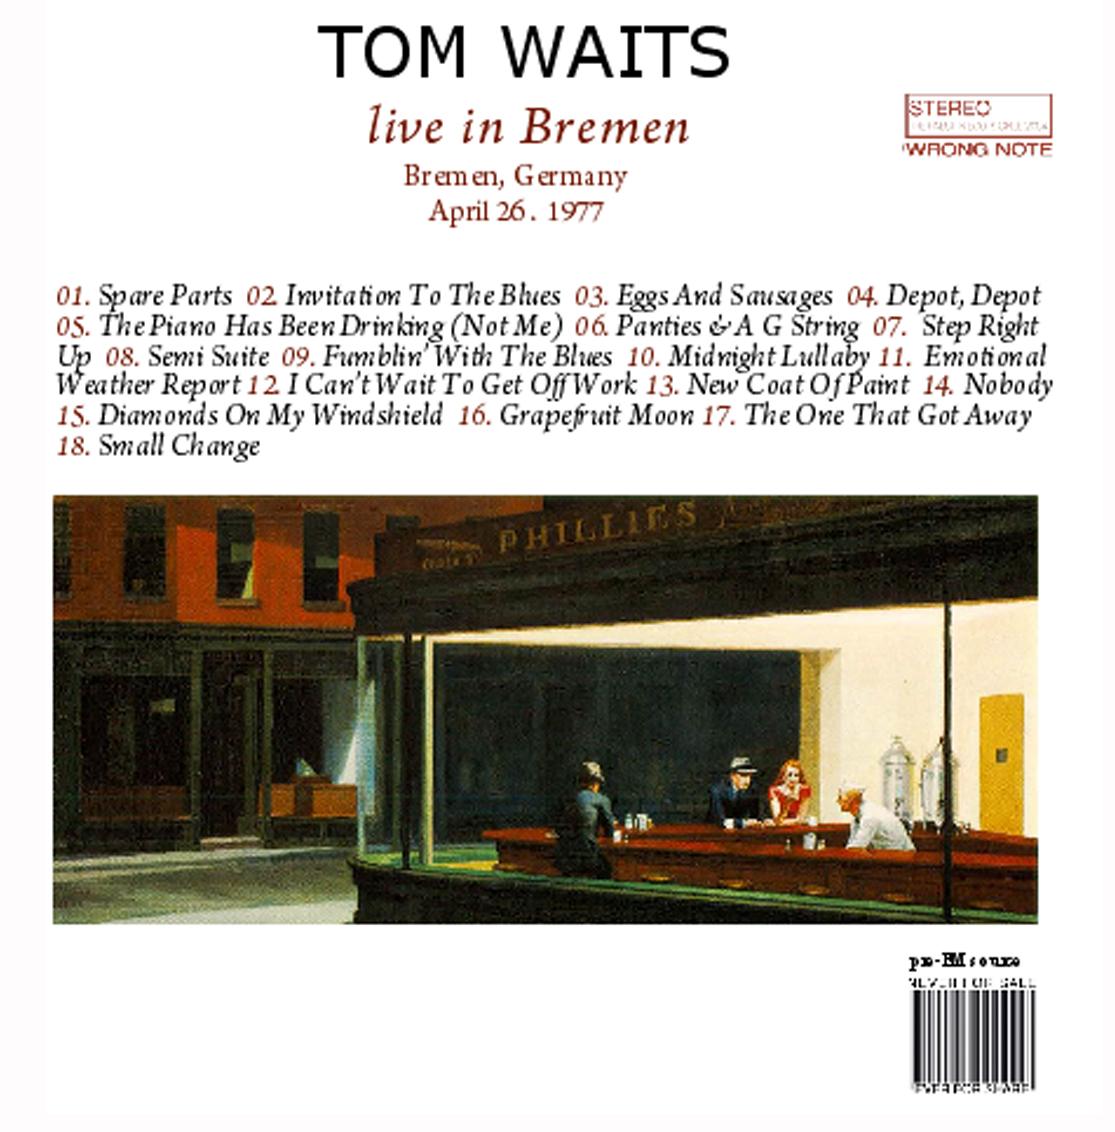 http://4.bp.blogspot.com/-FEf2qYljkII/URPxNwh7JpI/AAAAAAAAAmE/7O3yzc6iPXM/s1600/tom+waits+bremen+1977+back.jpg